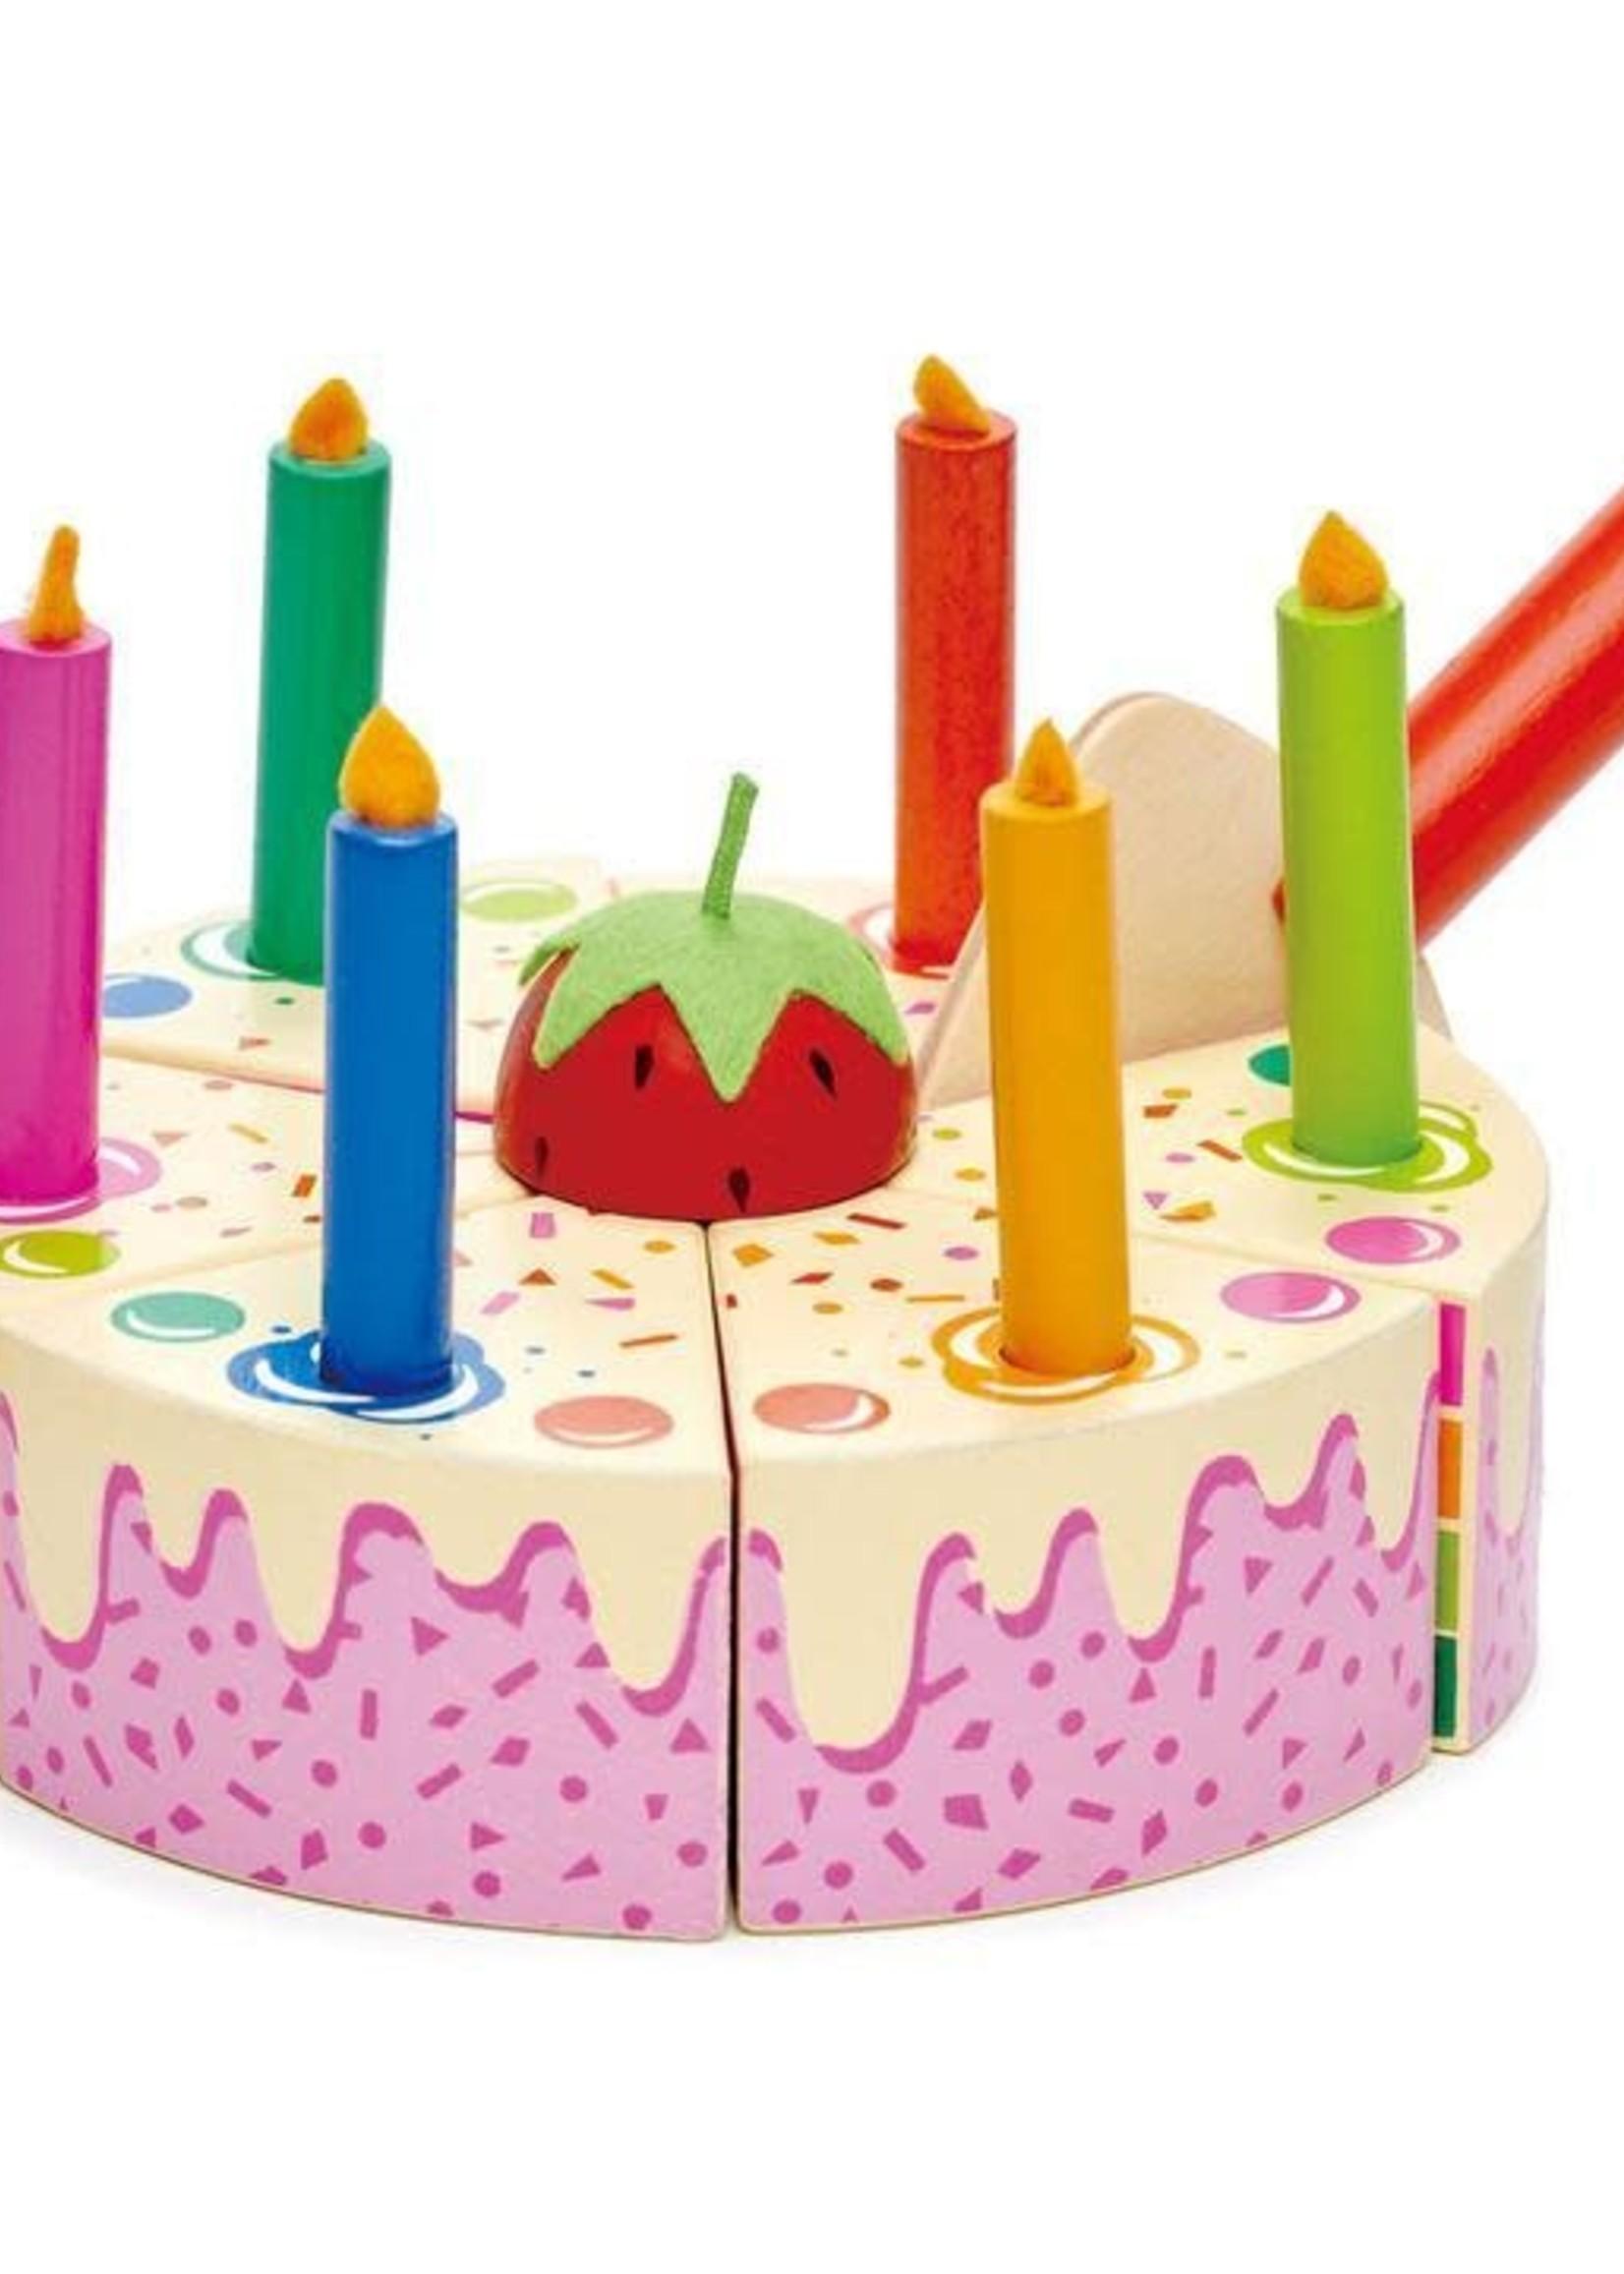 Tender Leaf Toy Tender Leaf Rainbow Birthday Cake